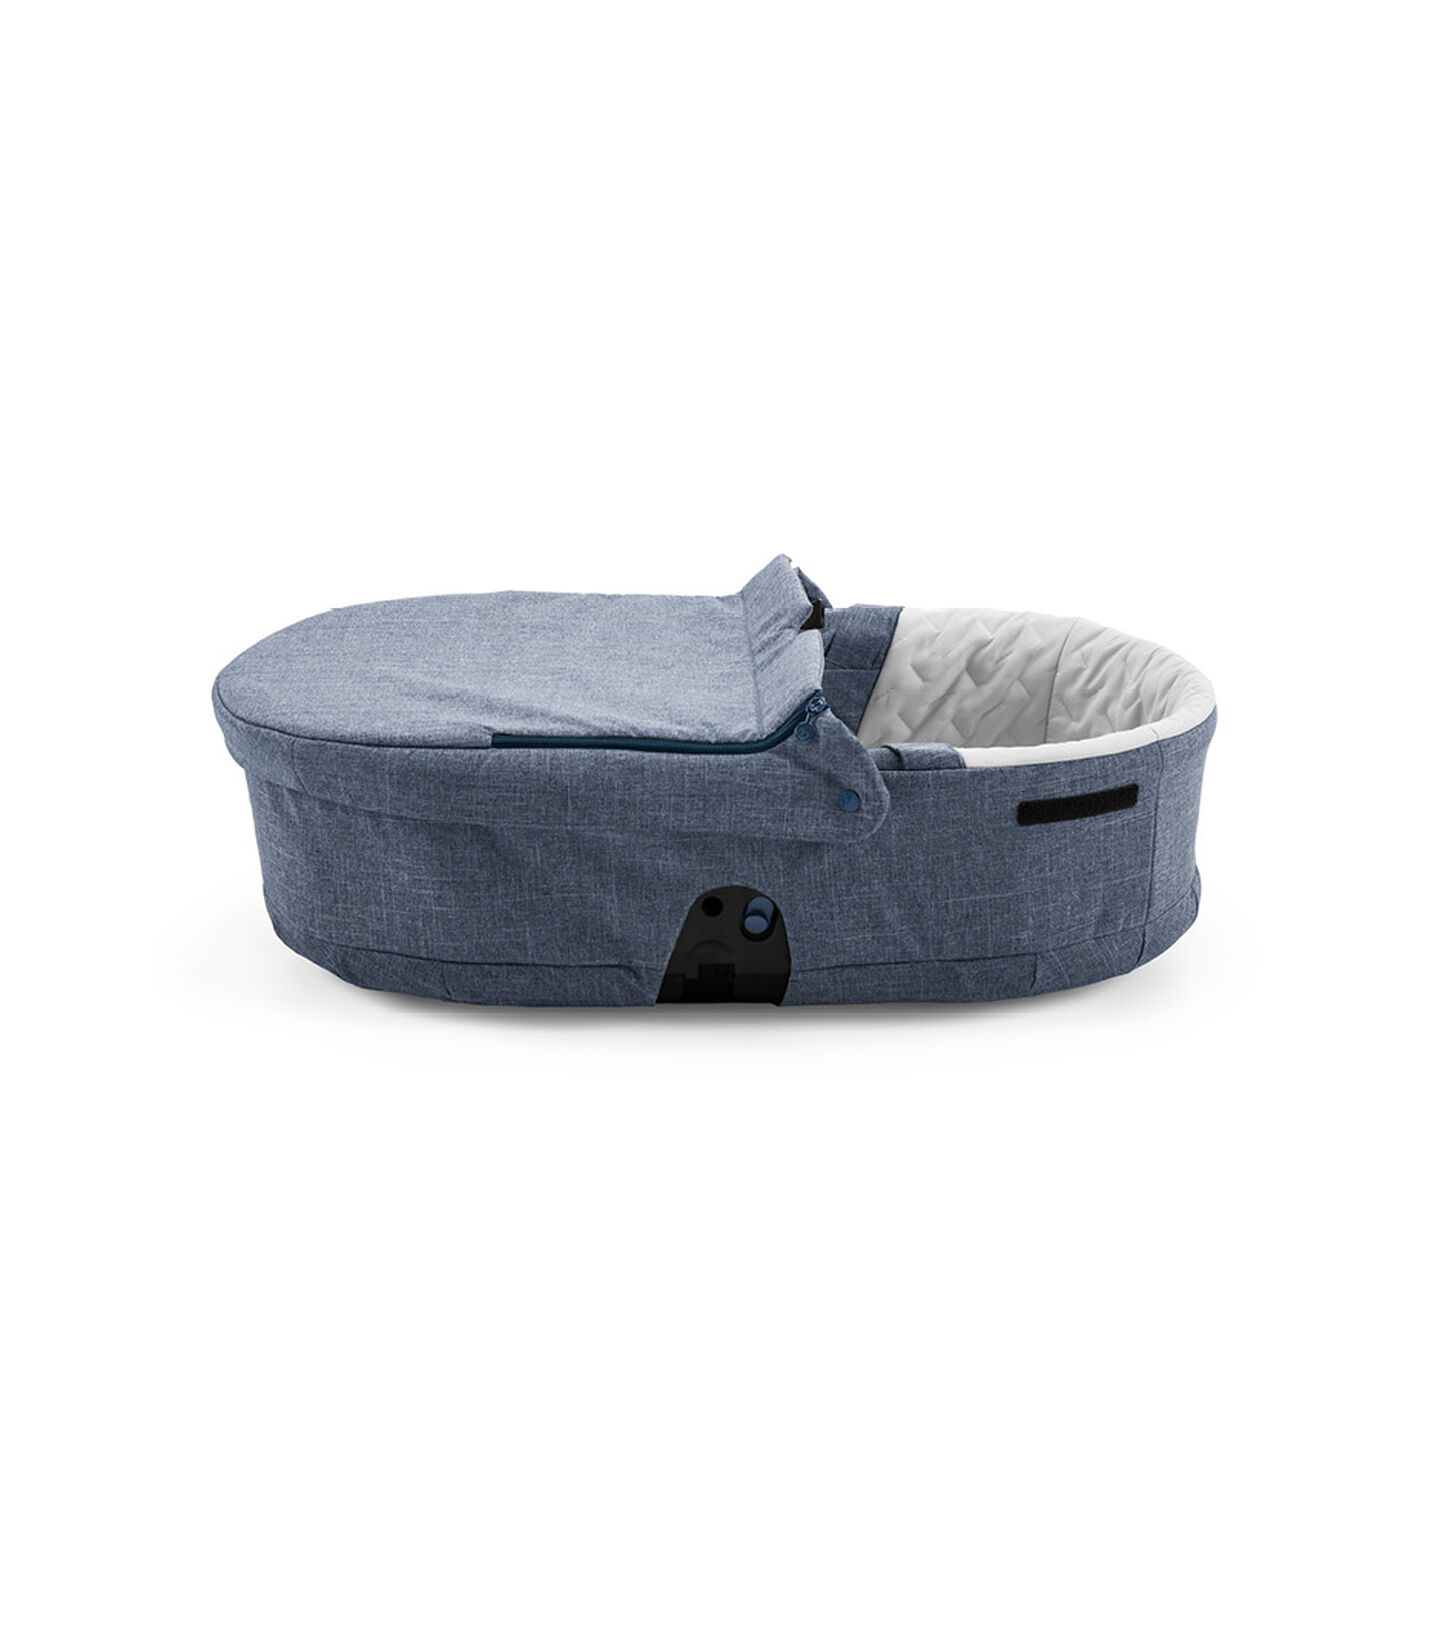 Stokke® Beat™ sparepart. Carry Cot Textile, Blue Melange. view 2